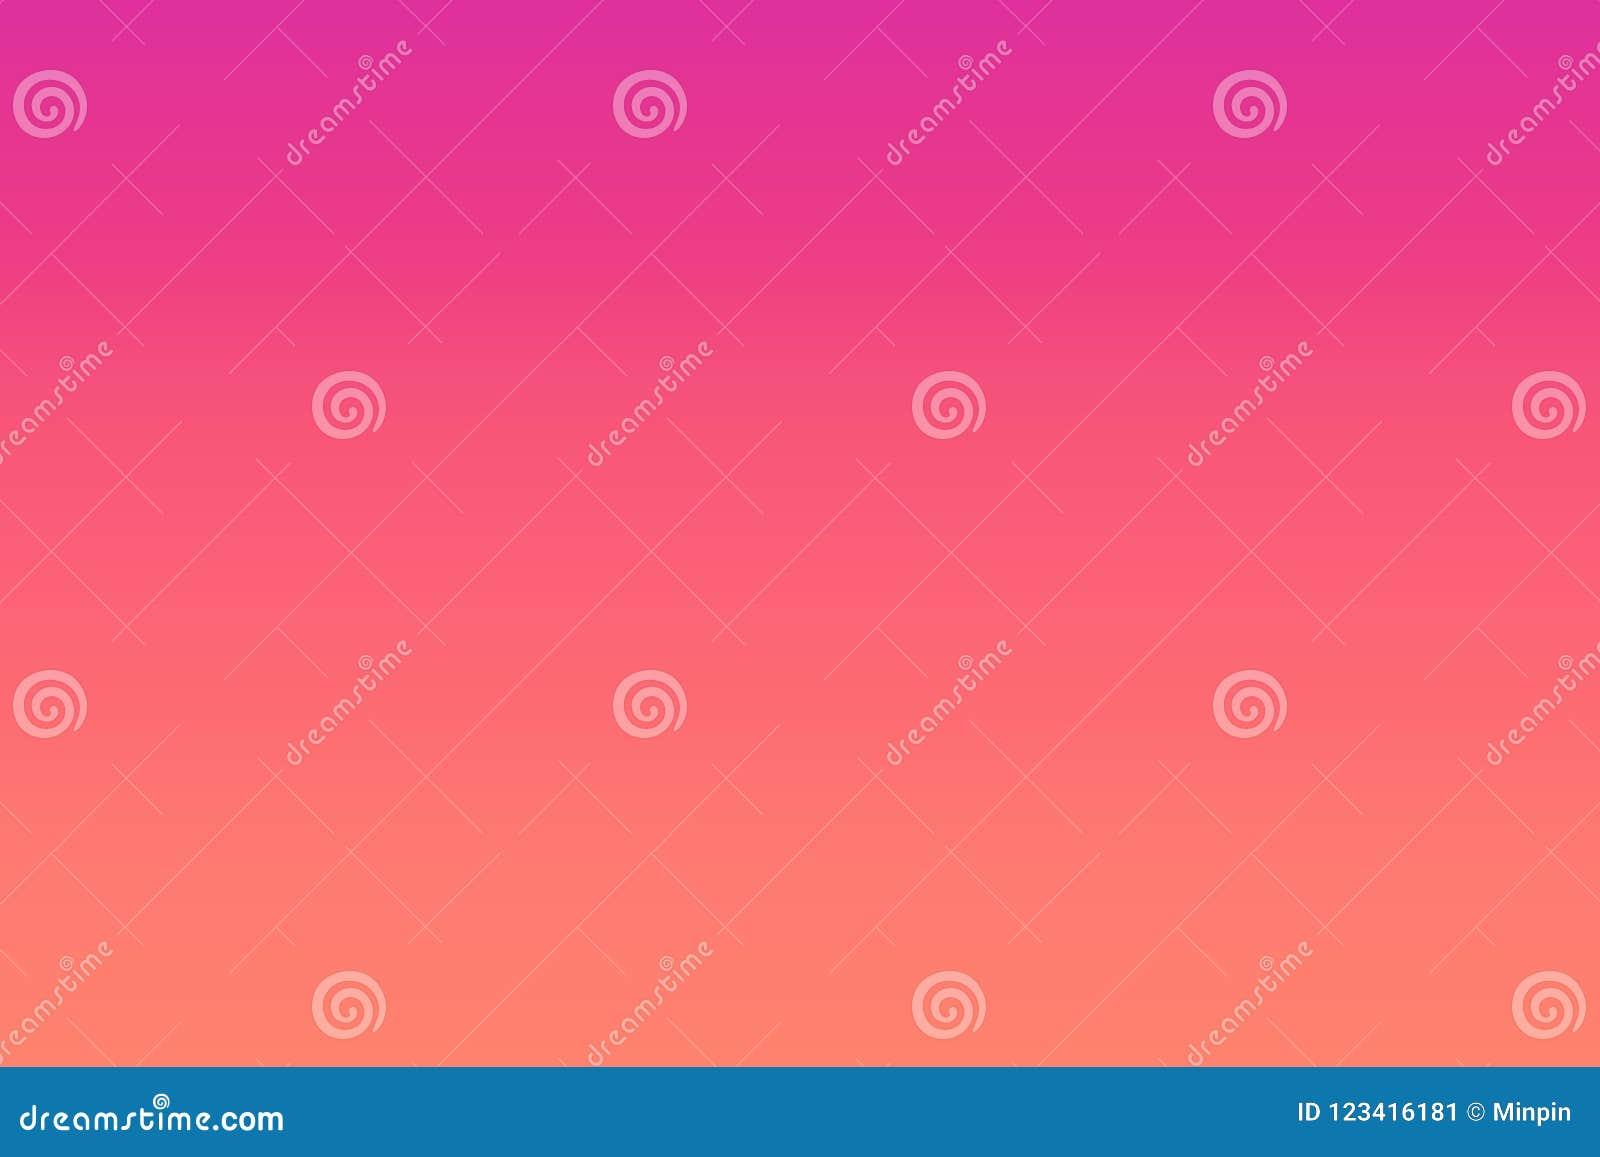 Abstract Koraal en Magenta Vlotte Gradiëntachtergrond